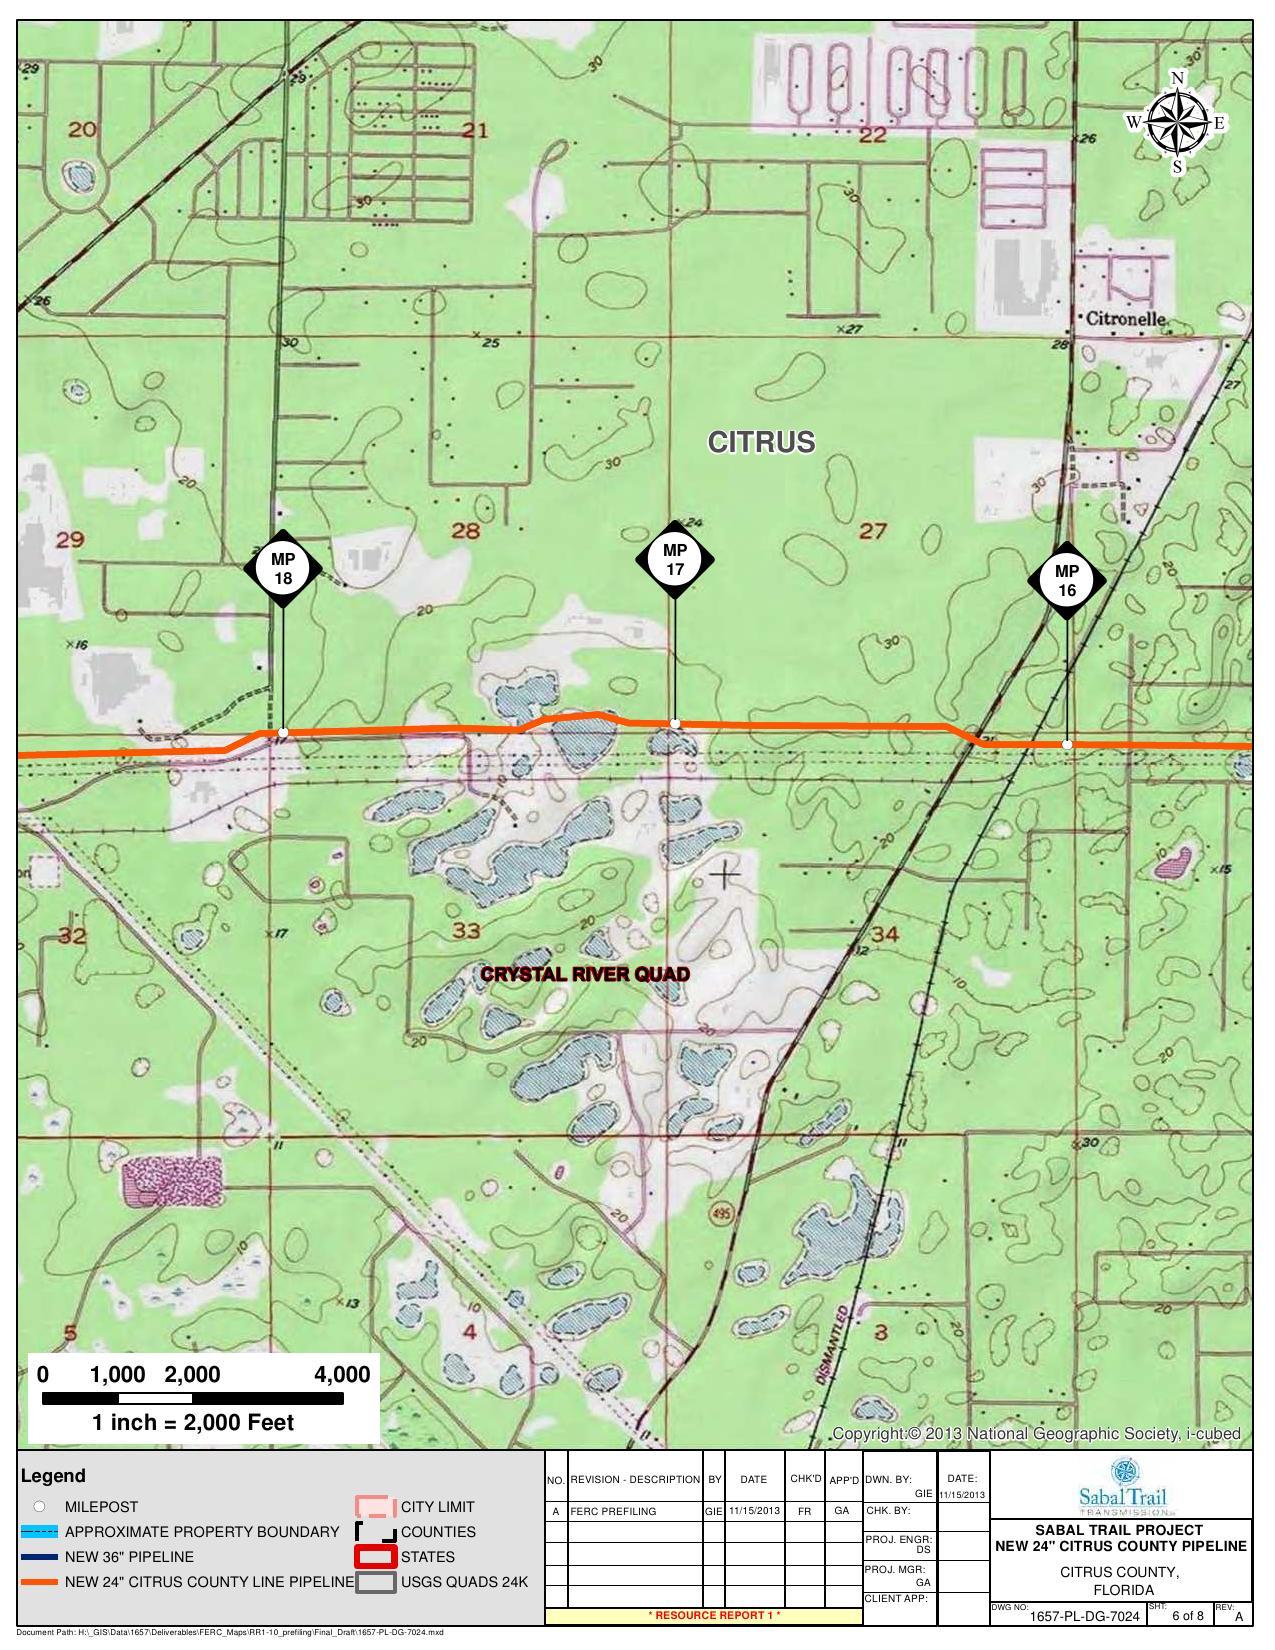 Citronelle Crystal River Quad Citrus County Pipeline Citrus - Florida quad map